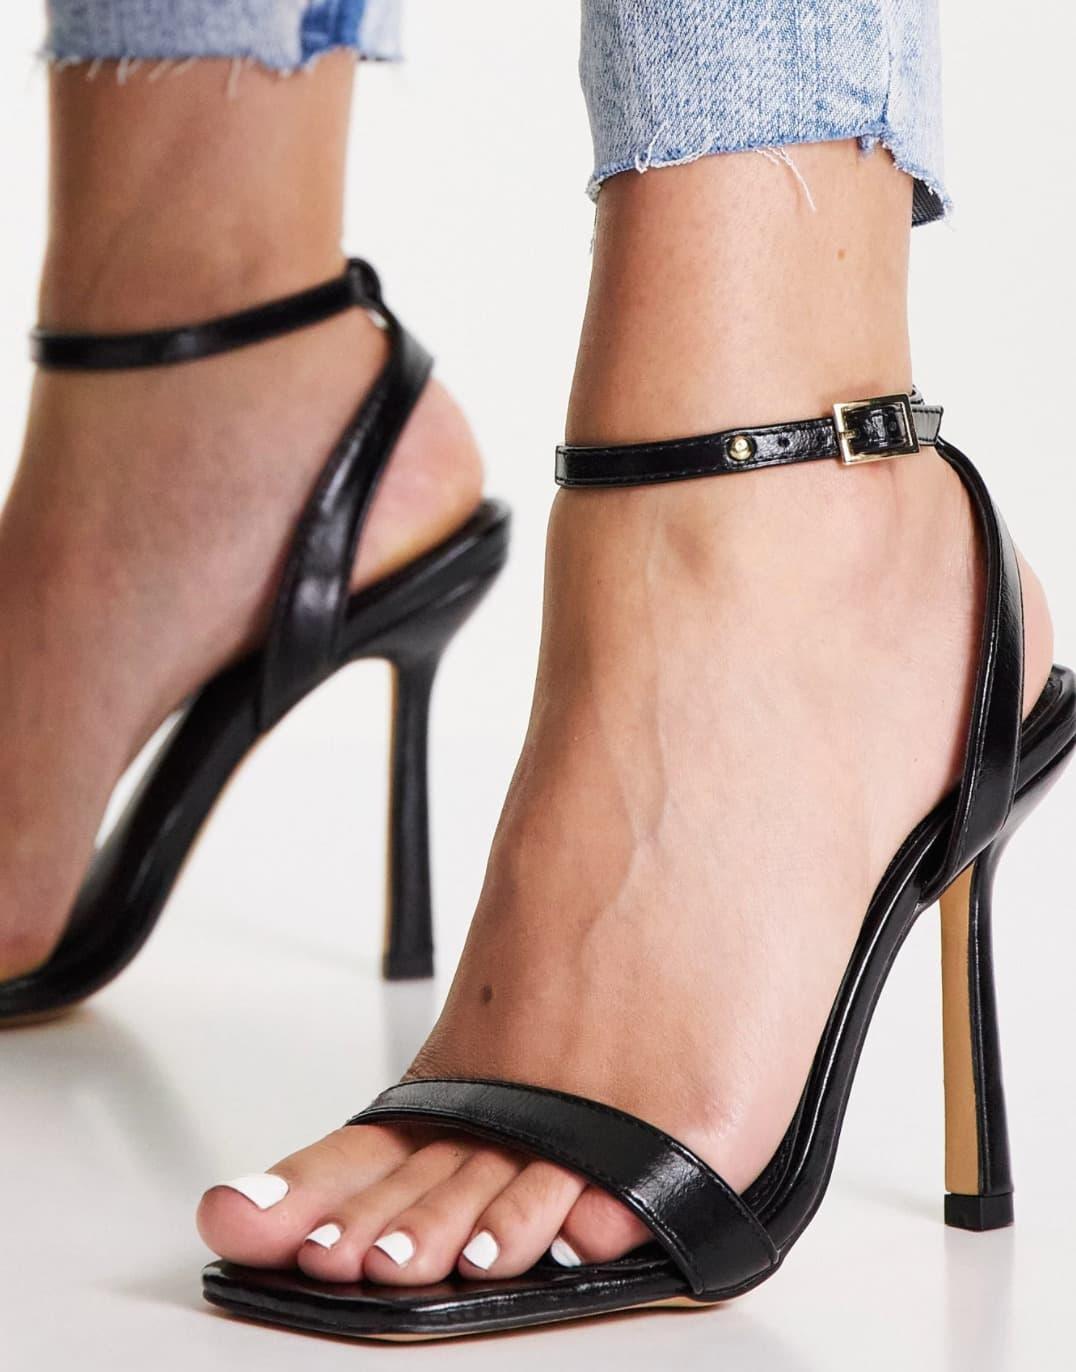 Sandalias negras con tacón alto y diseño de dos partes Samba de Topshop